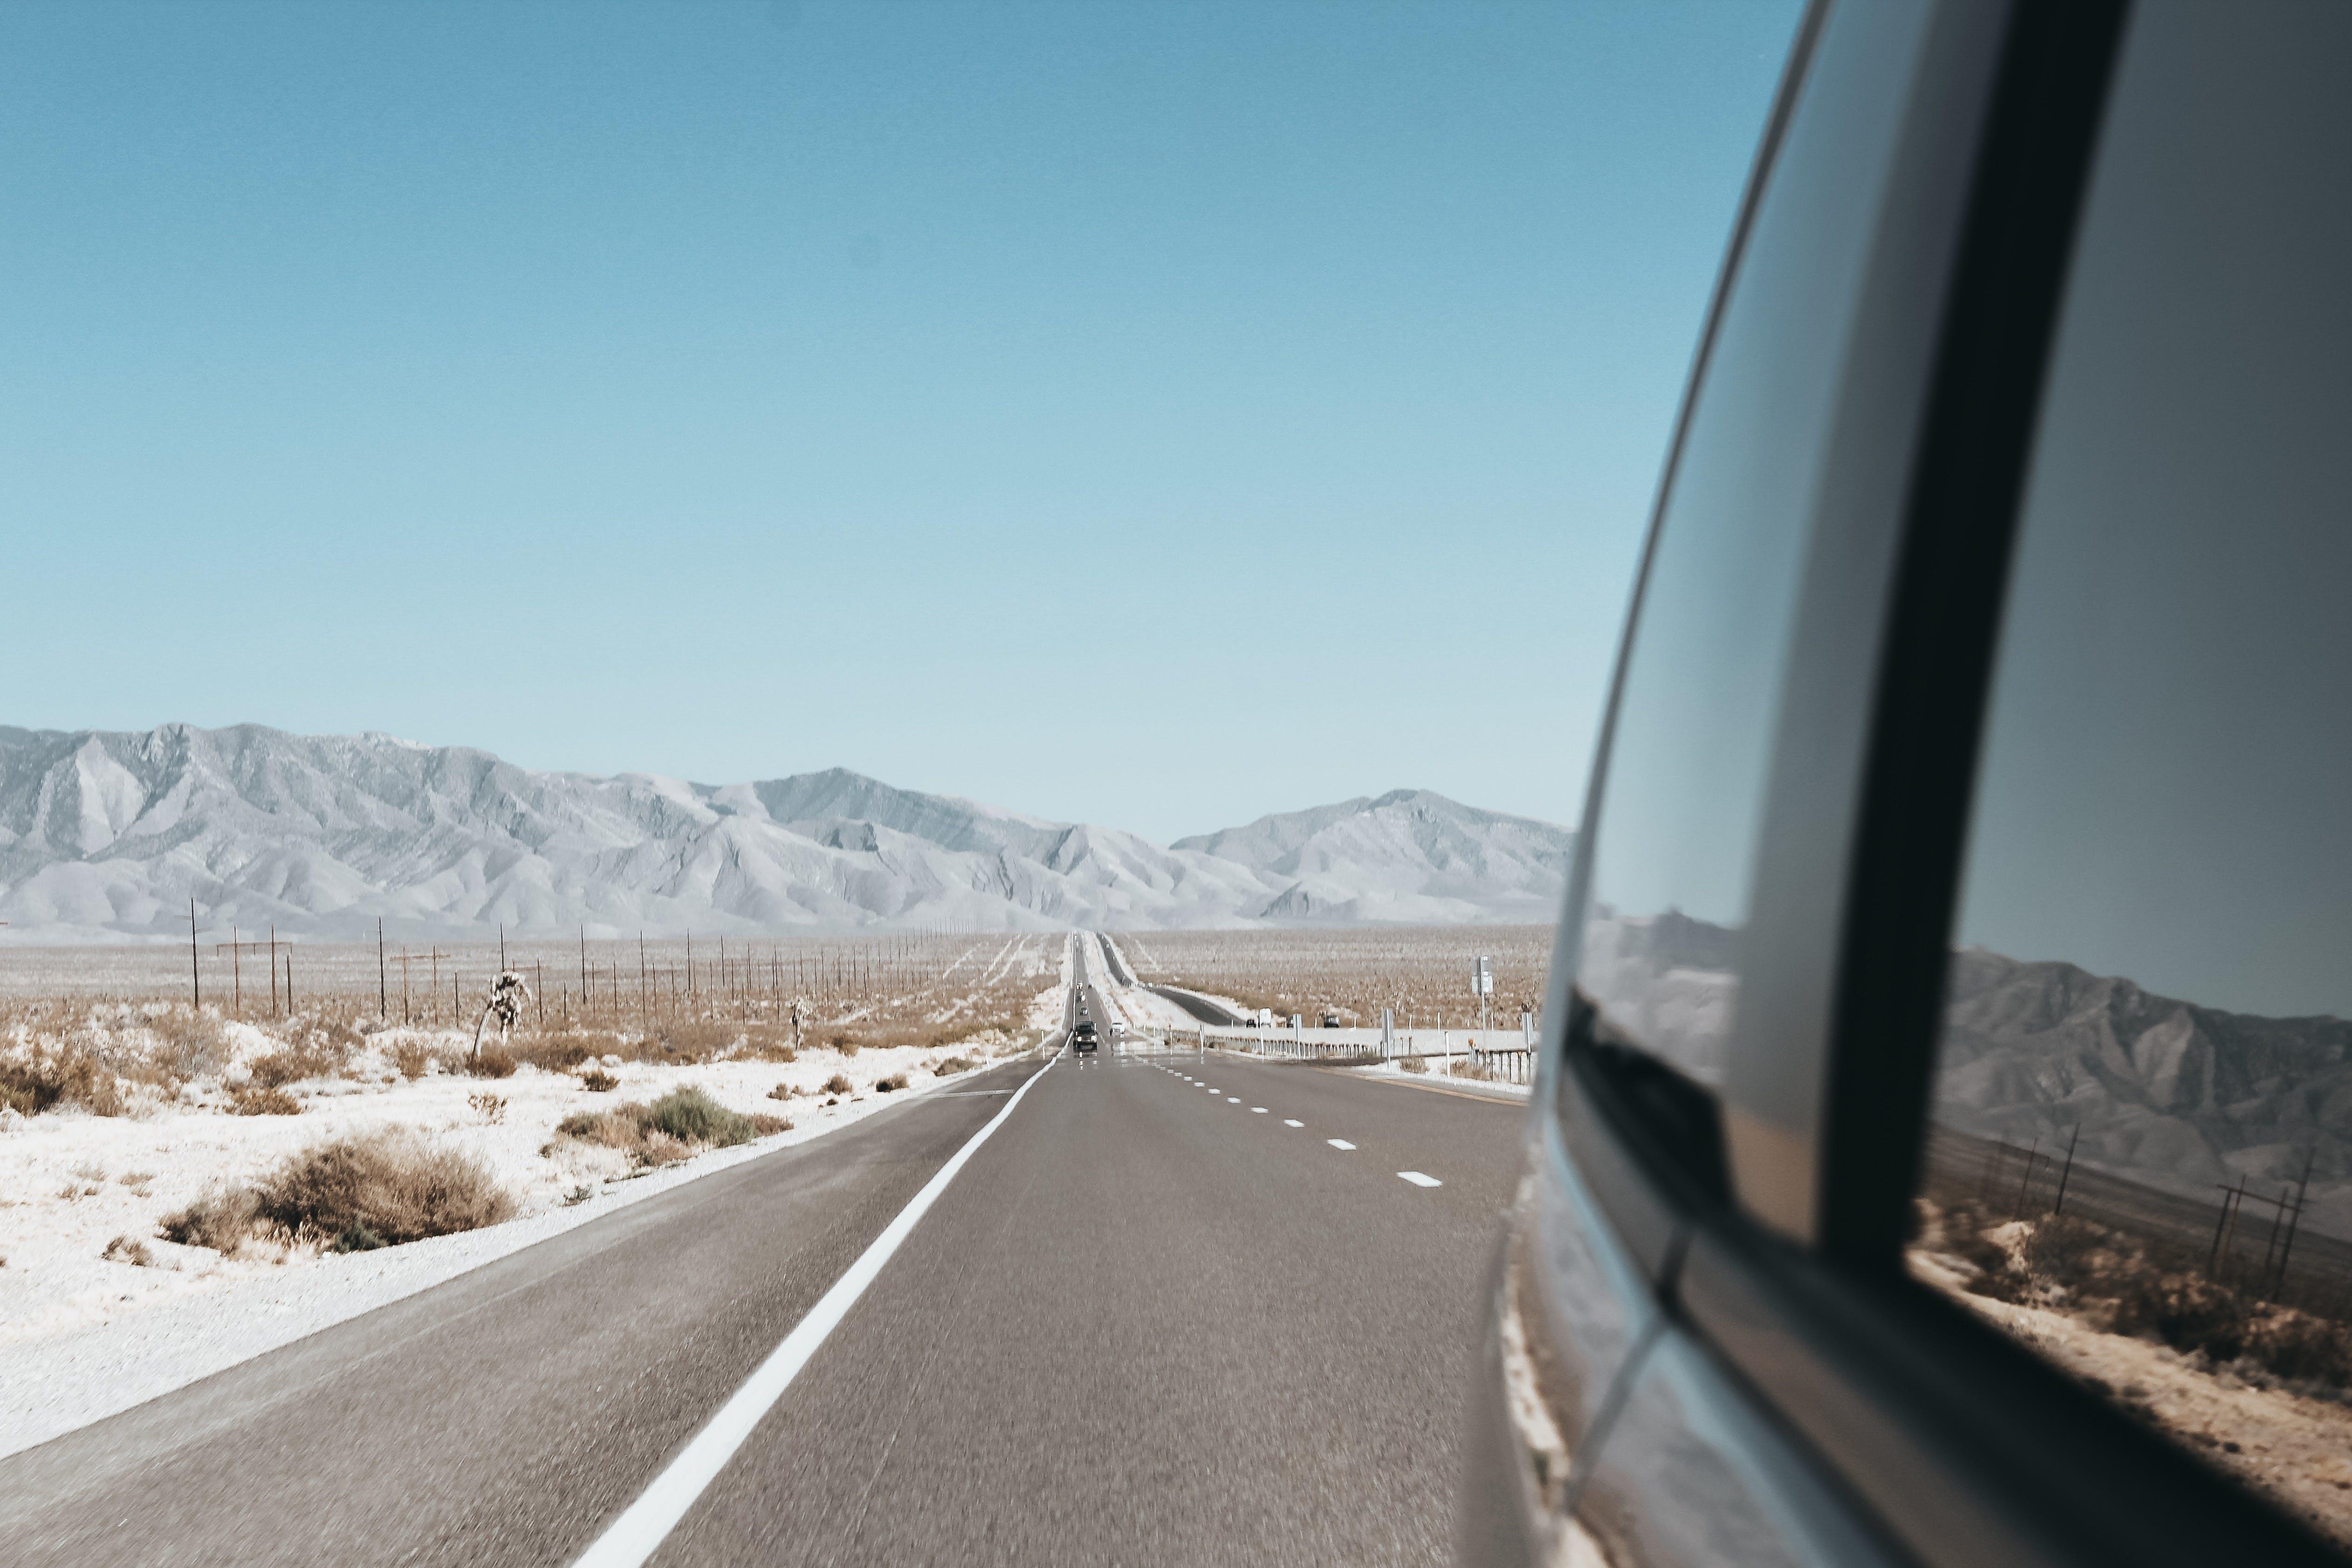 Kostenloses Stock Foto zu asphalt, ausflug), autofenster, autos